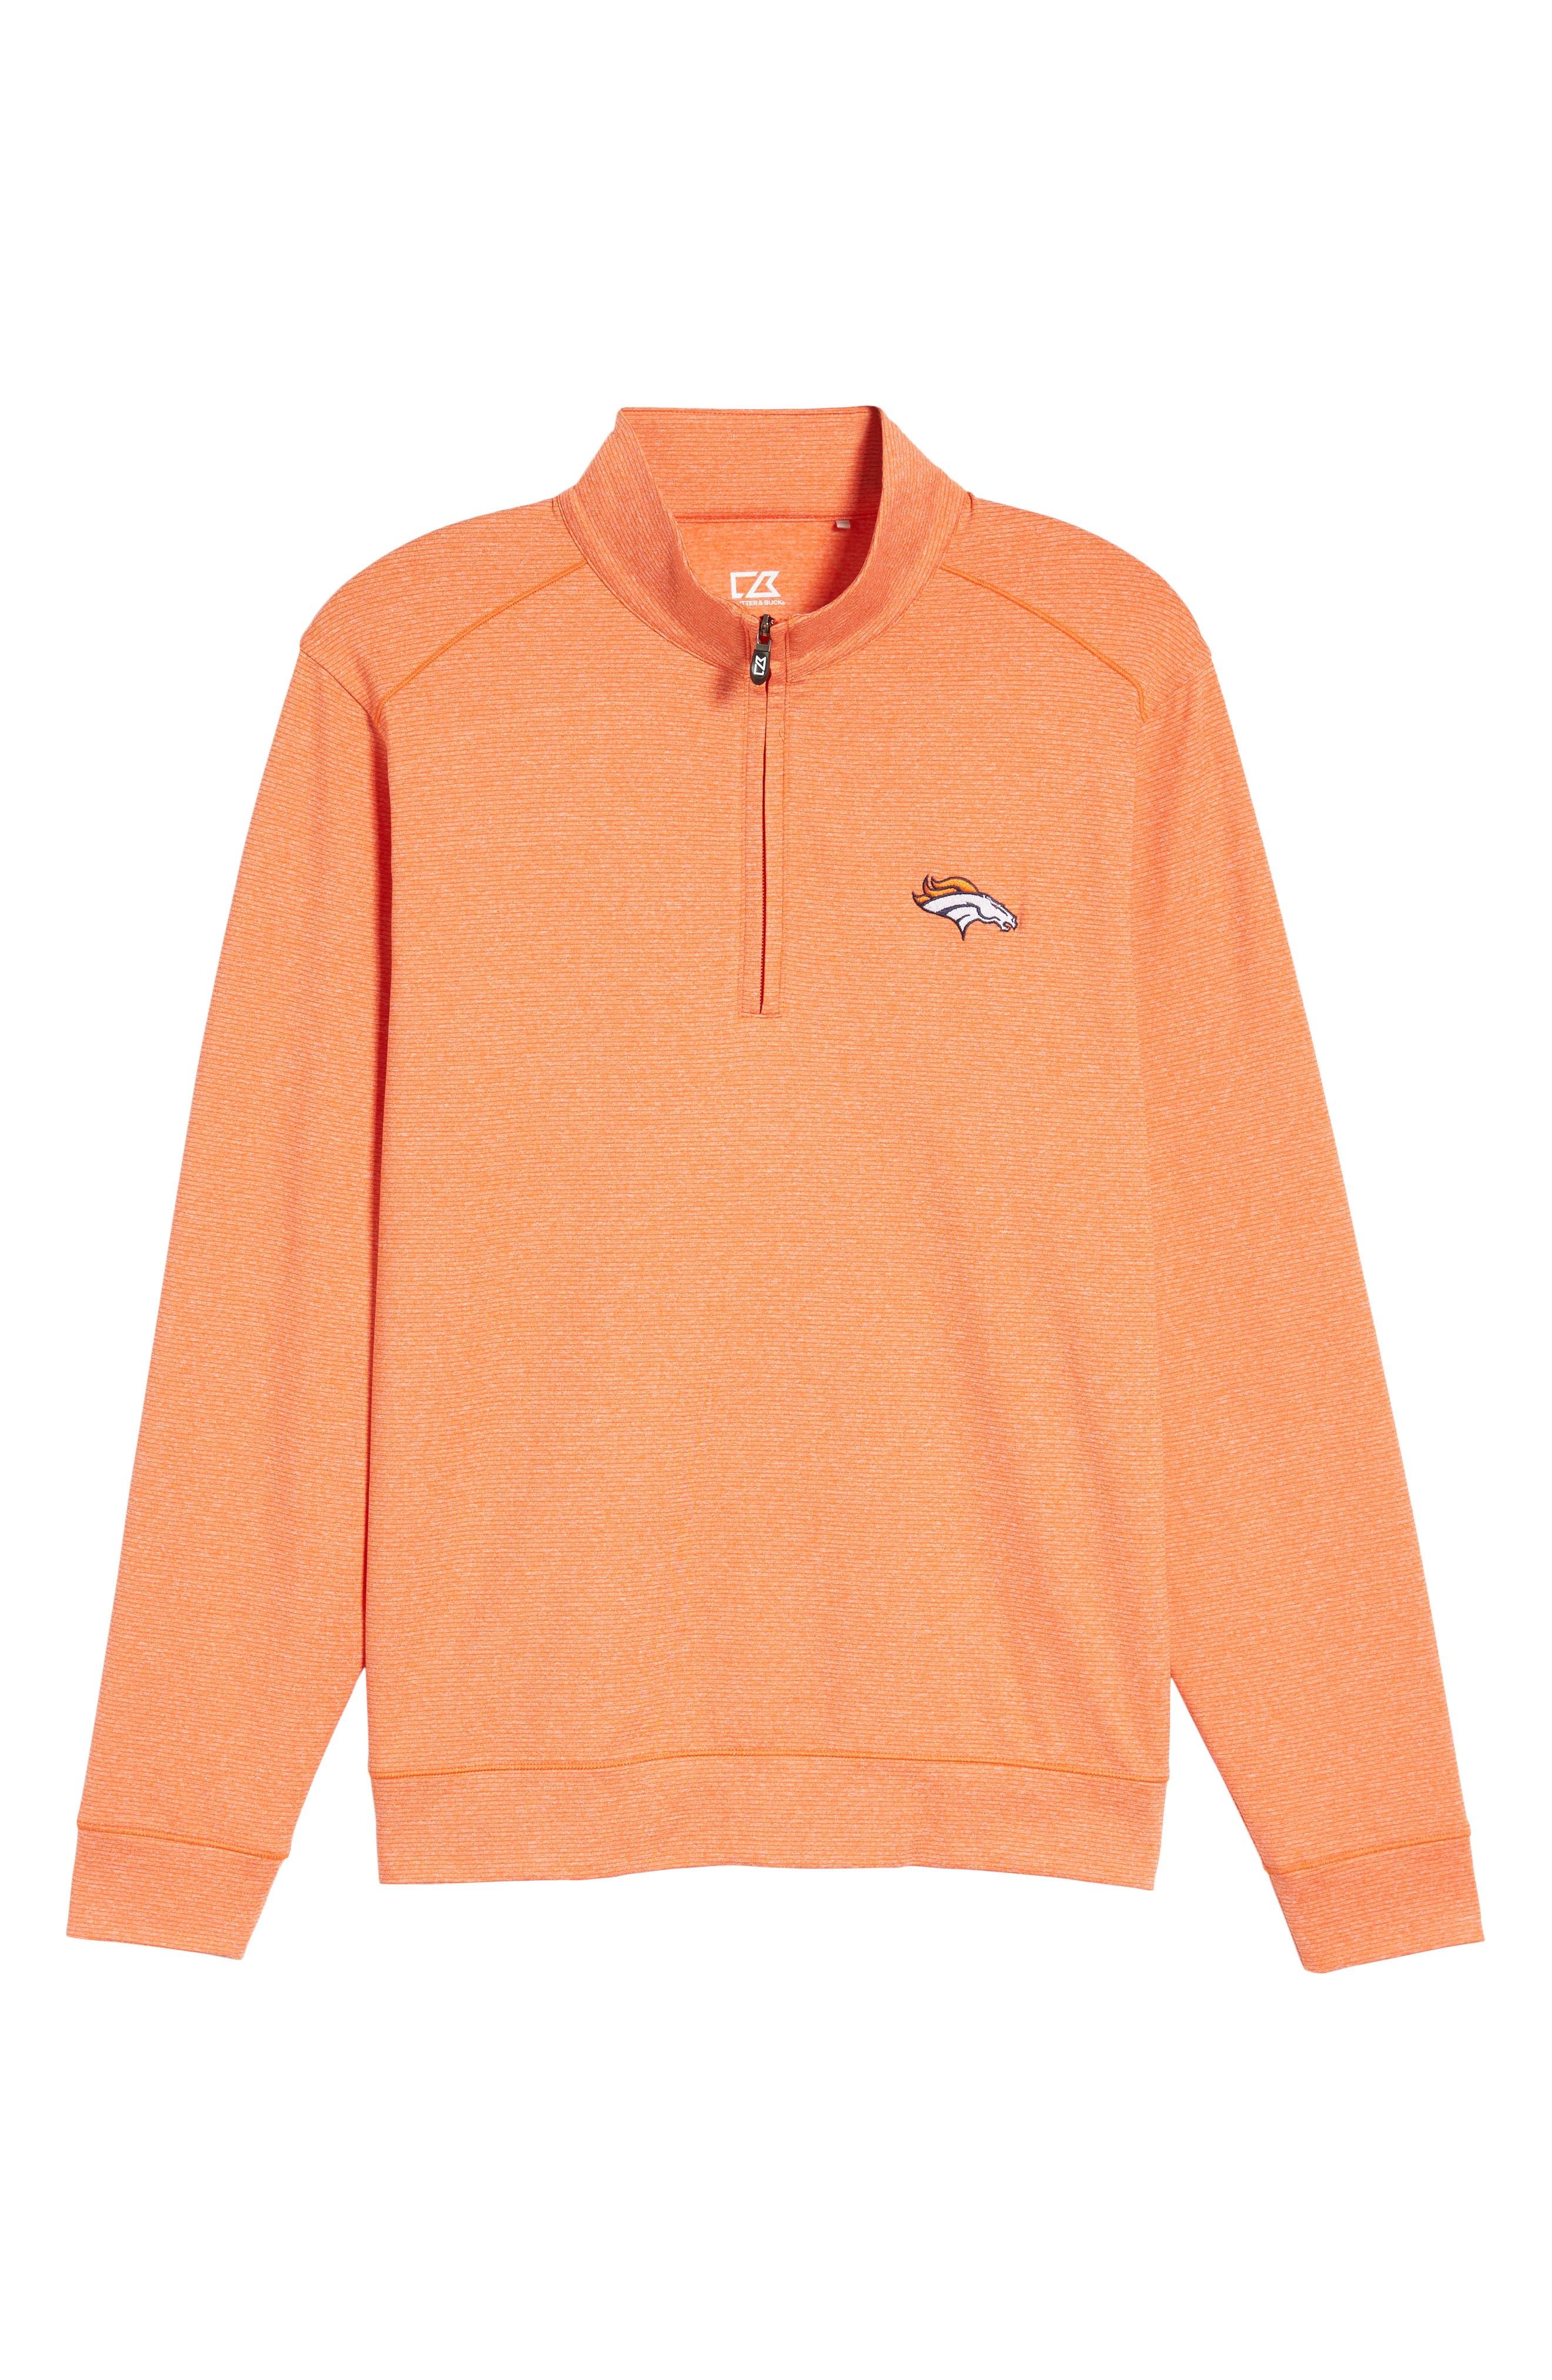 Shoreline - Denver Broncos Half Zip Pullover,                             Alternate thumbnail 6, color,                             College Orange Heather